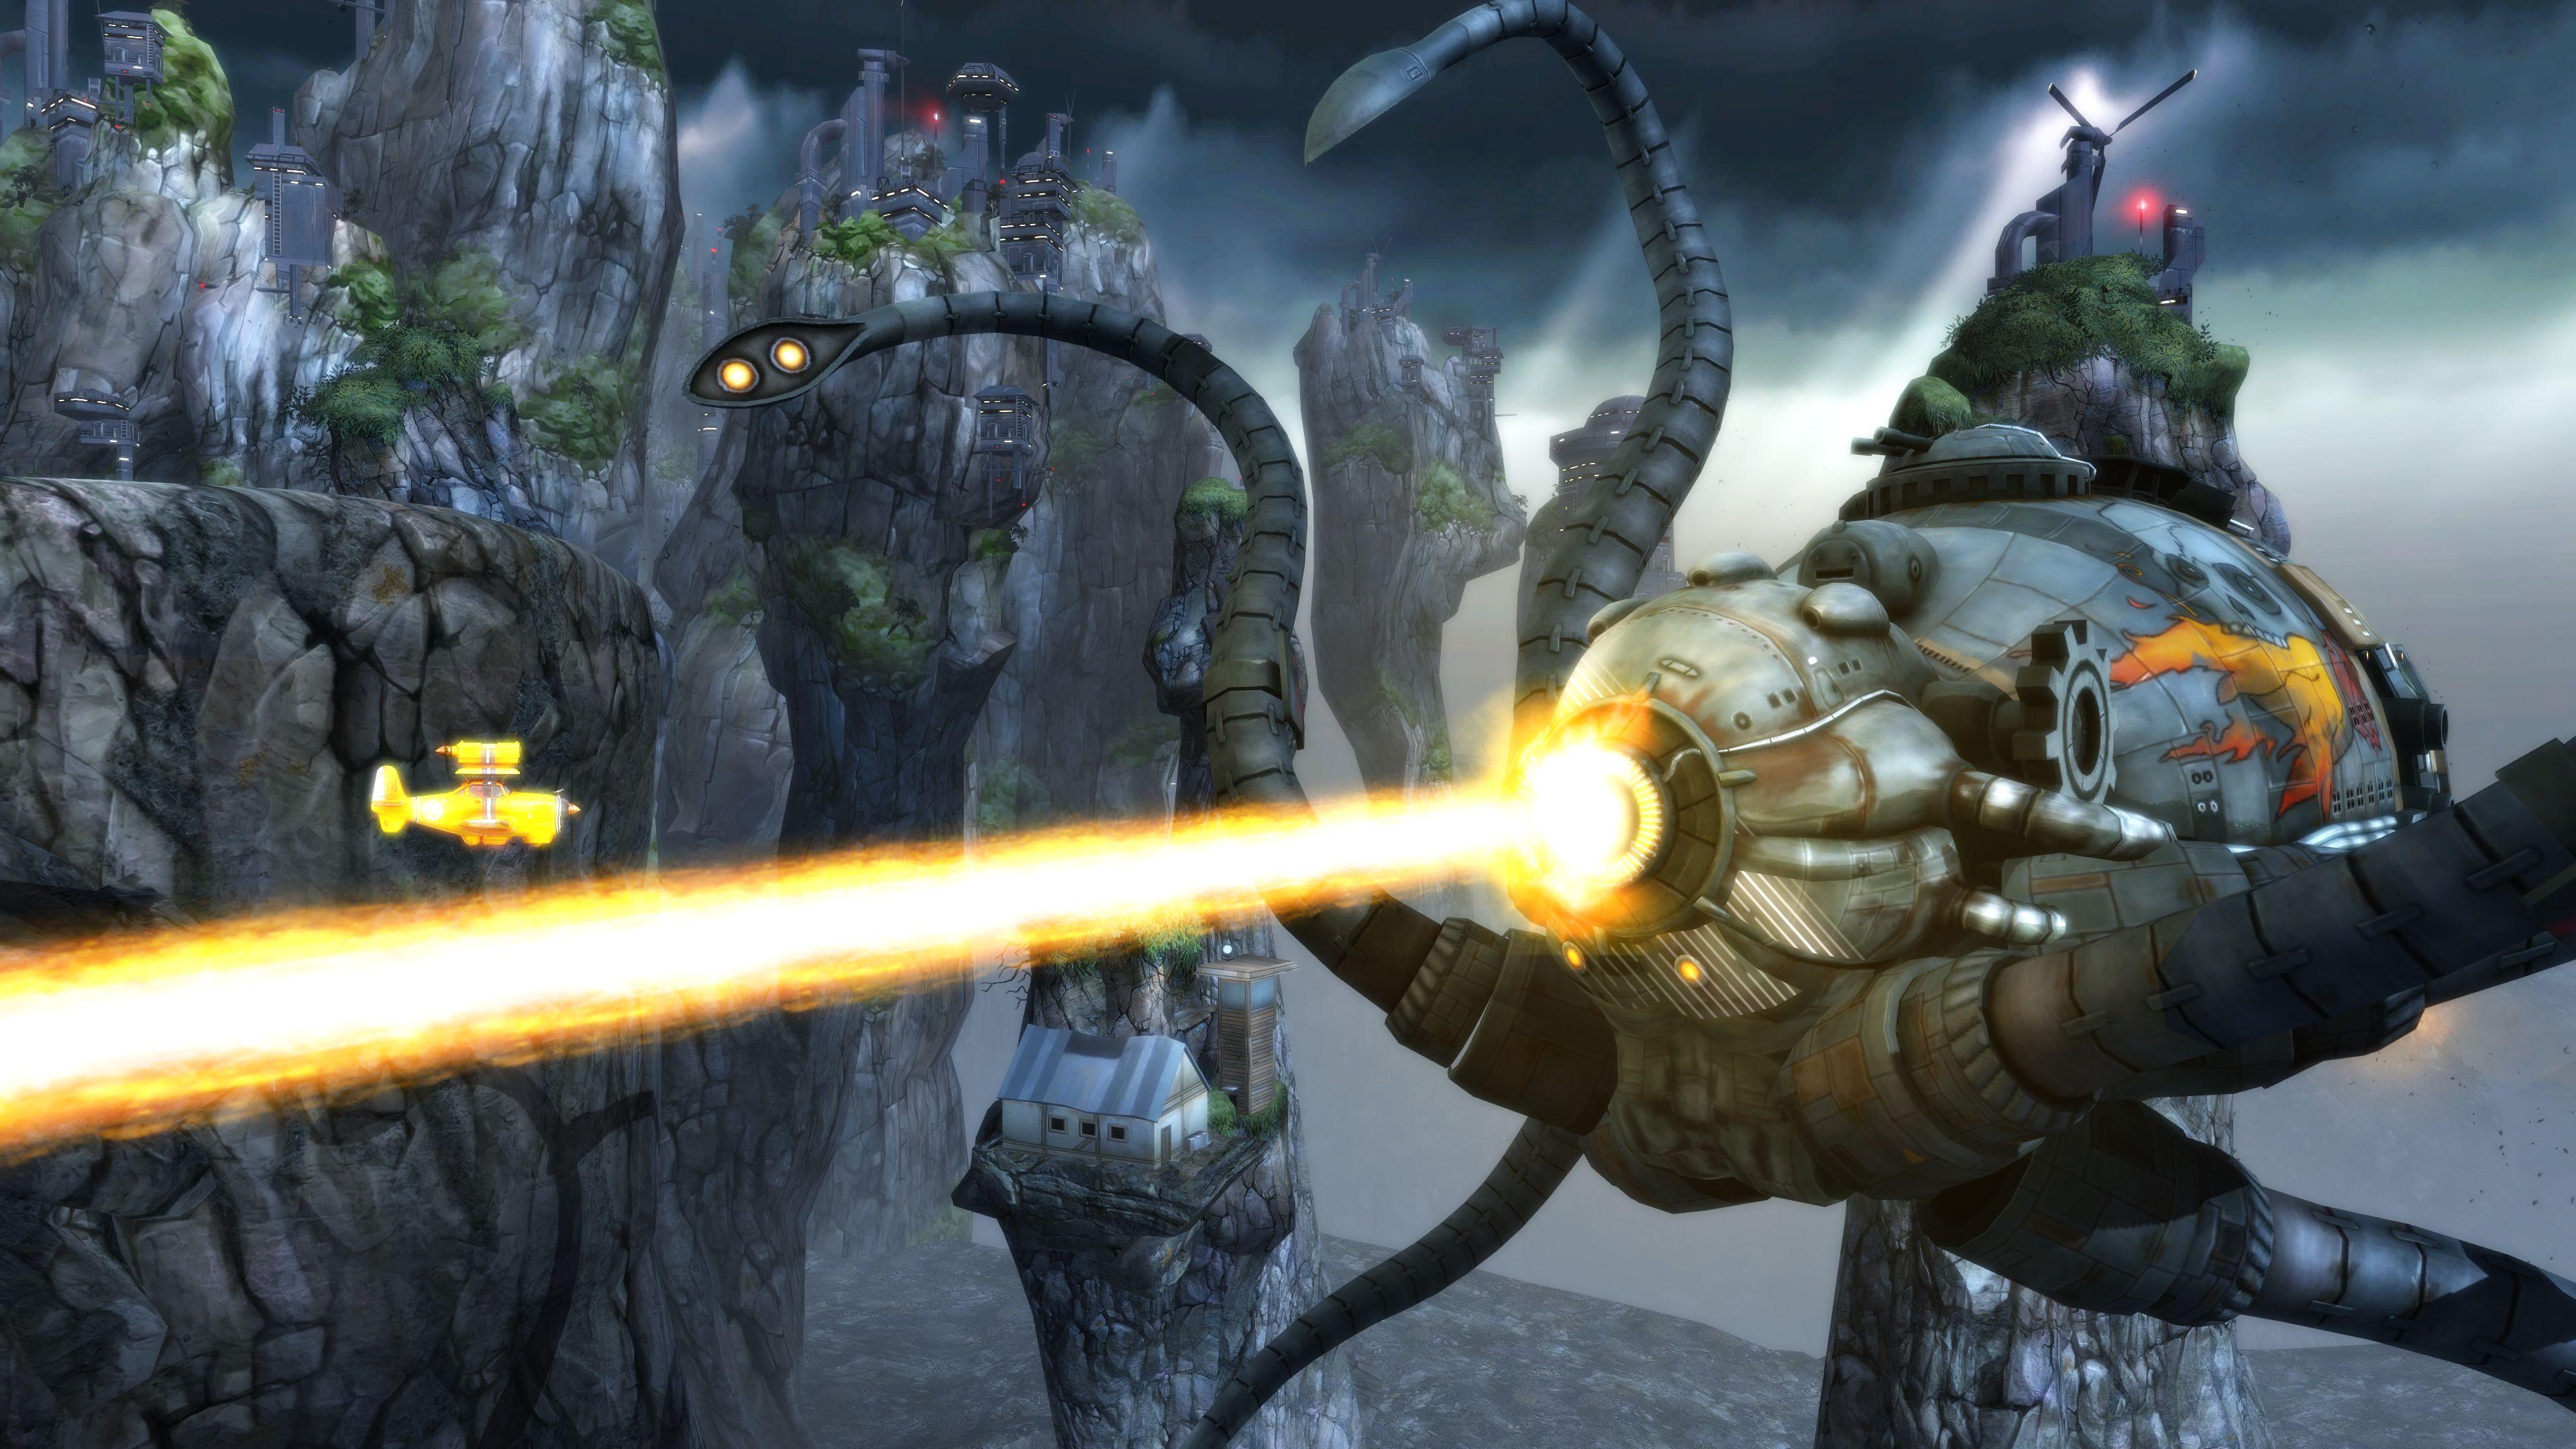 Hry pro Switch se rozrostou o Battle Chasers: Nightwar a Sine Mora EX 142160